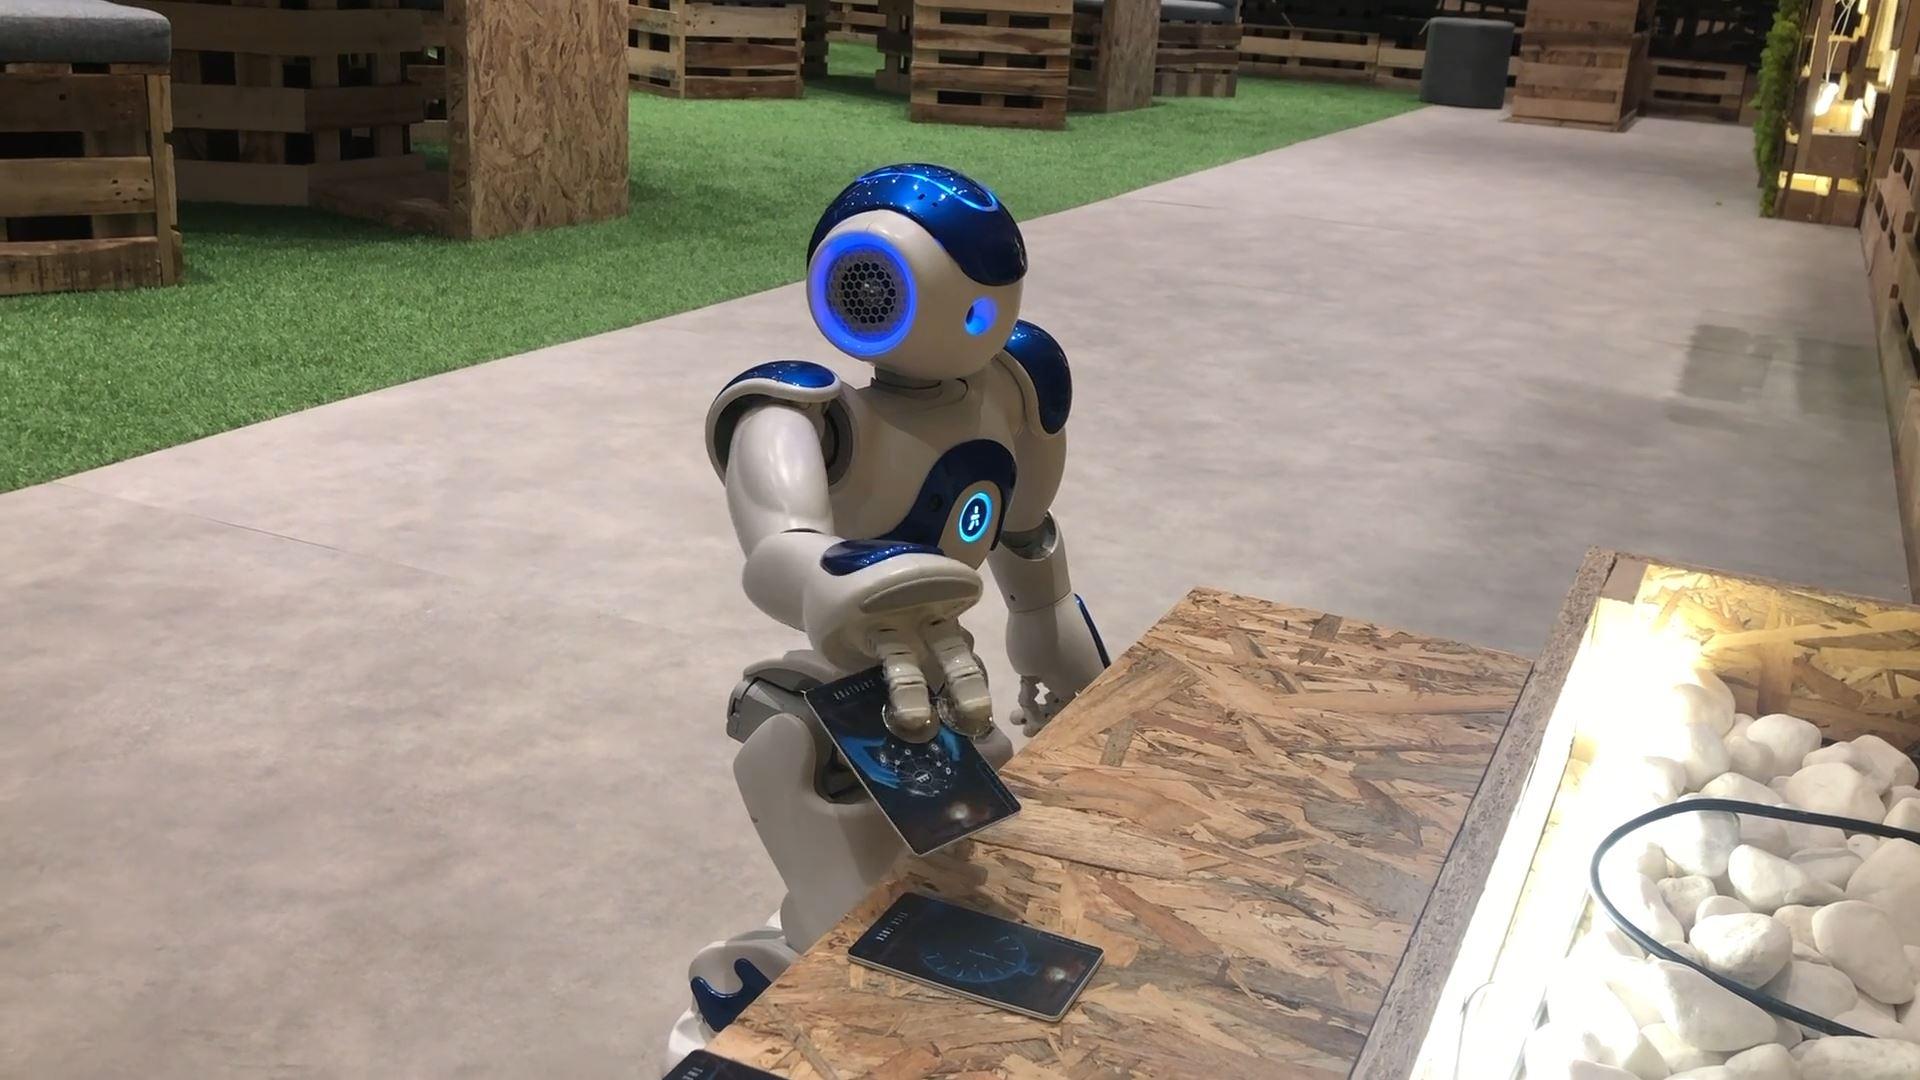 sharjah e-Government retreat interactive technology integration robot tarrot cards